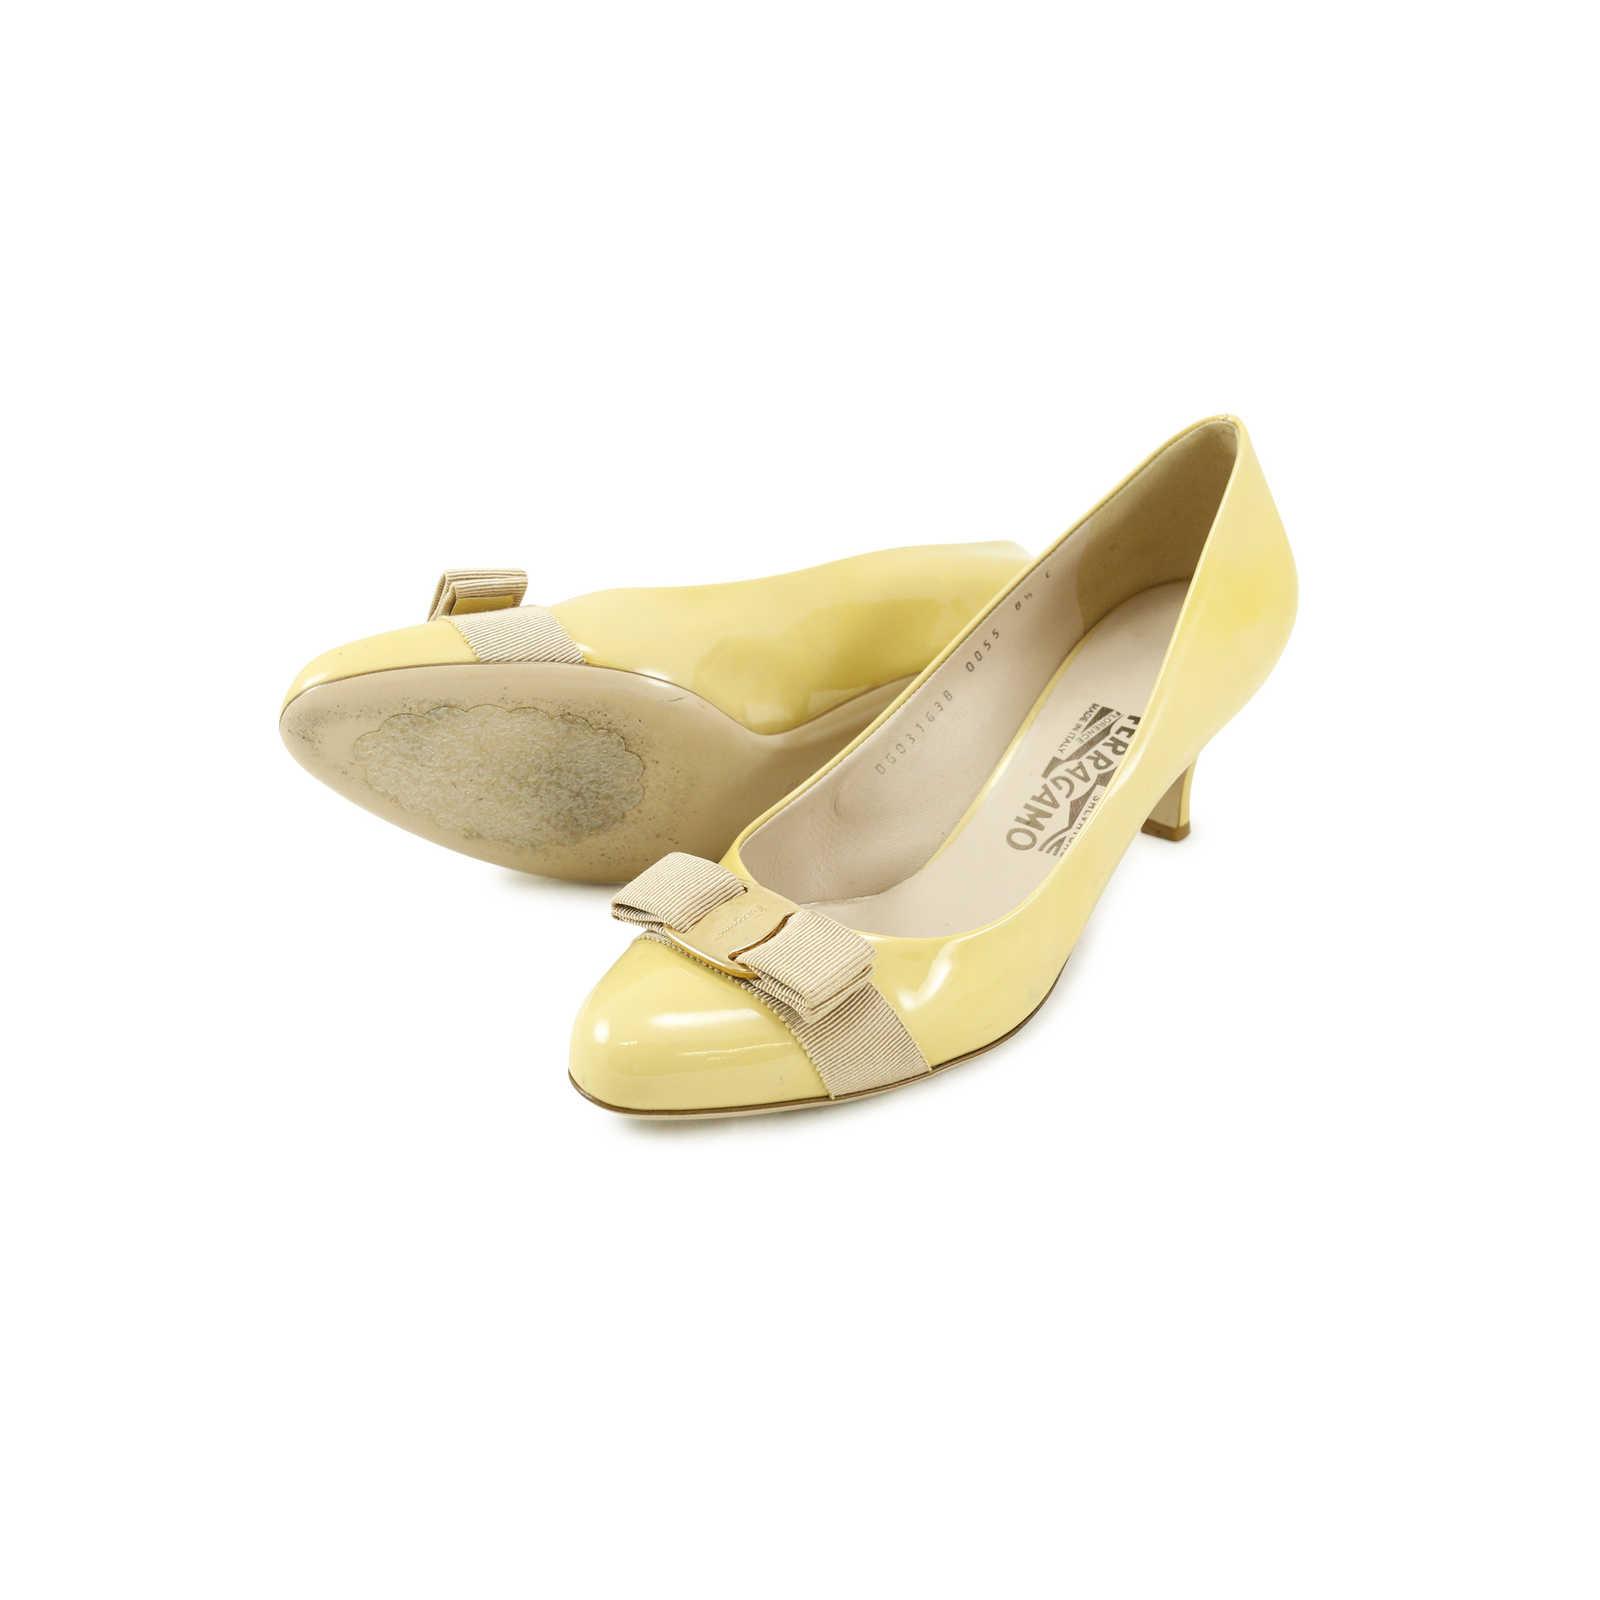 e4a827e93a ... Authentic Second Hand Salvatore Ferragamo Patent Pumps with Kitten Heel  (PSS-030-00003 ...